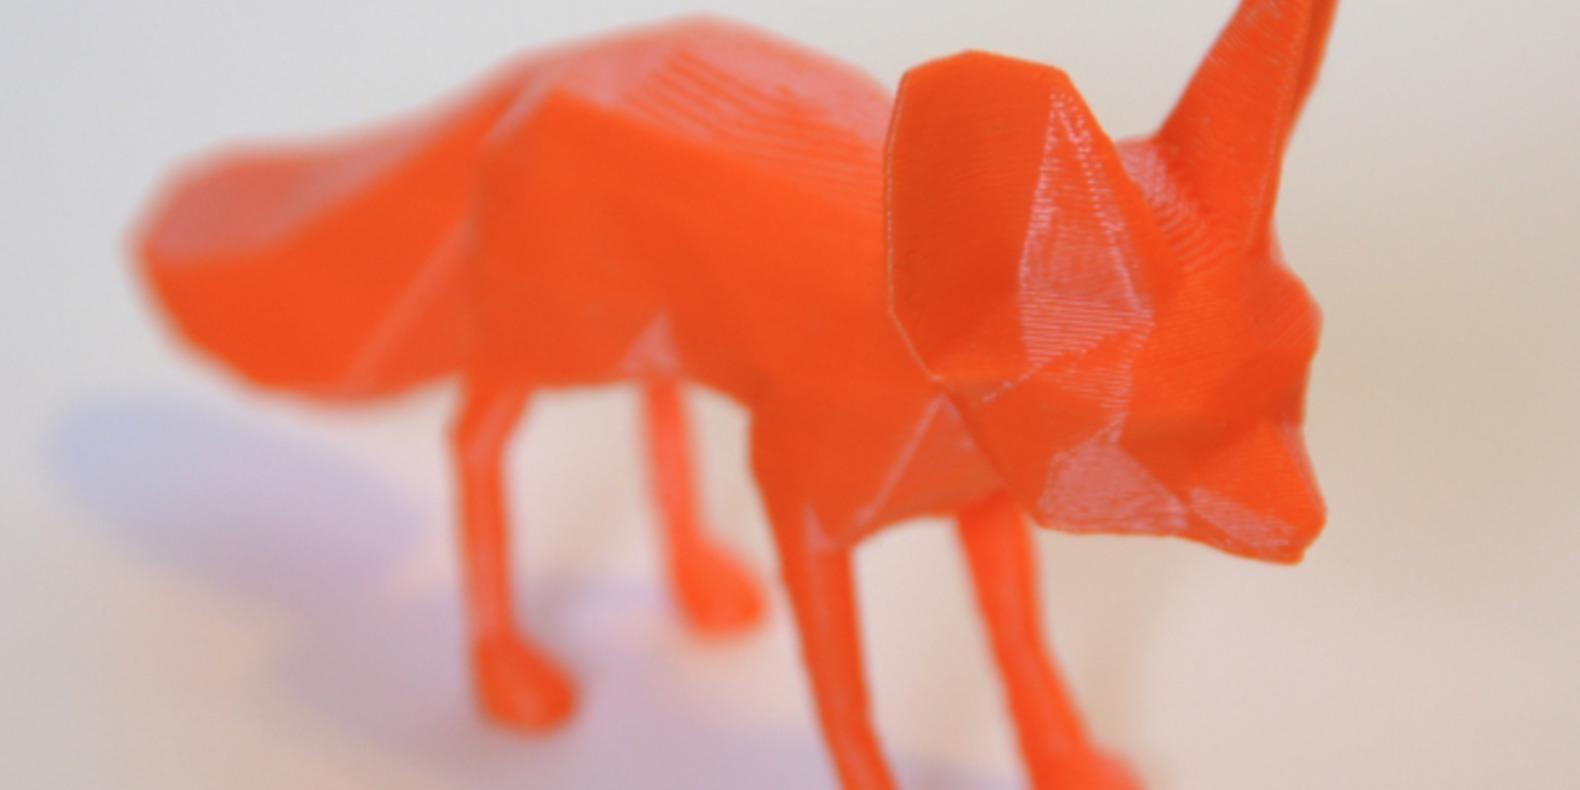 7.Fennec-Physics_Dude animaux imprimés en 3D Cults fichier 3D 3D model 3D printing